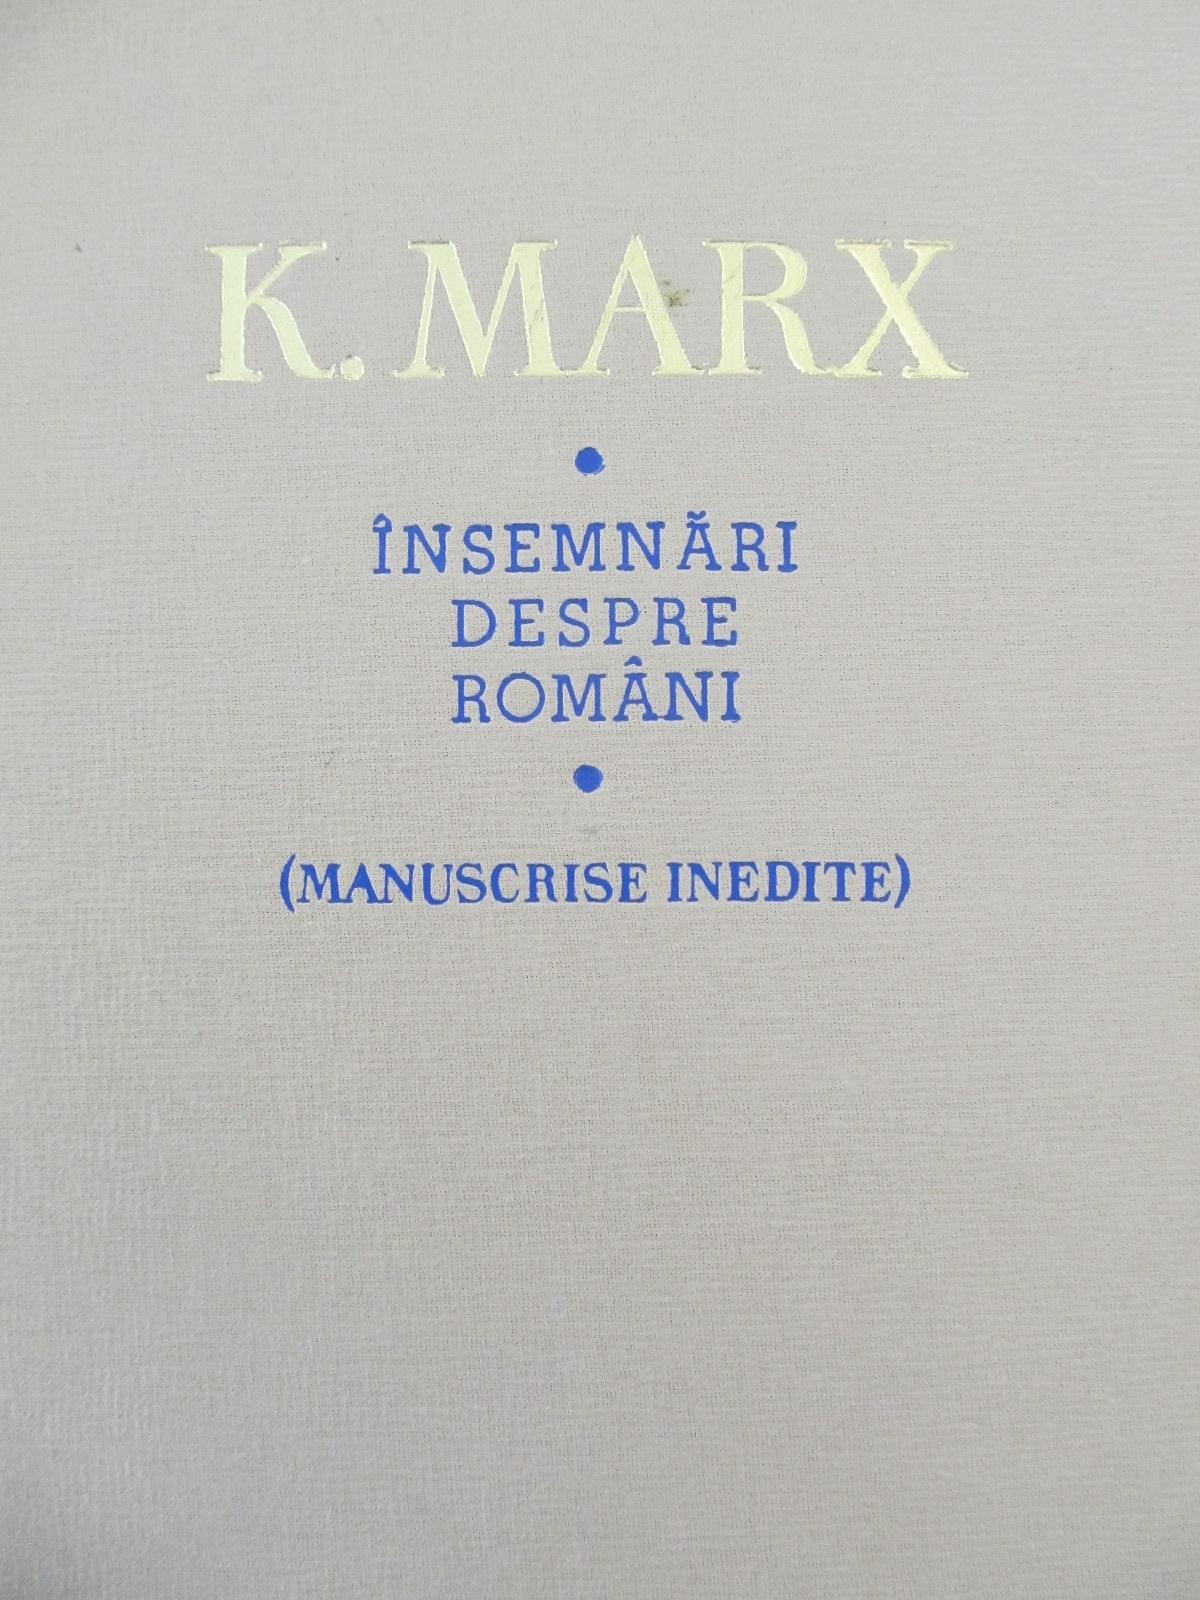 Insemnari despre romani (Manuscrise inedite) - K. Marx | Detalii carte